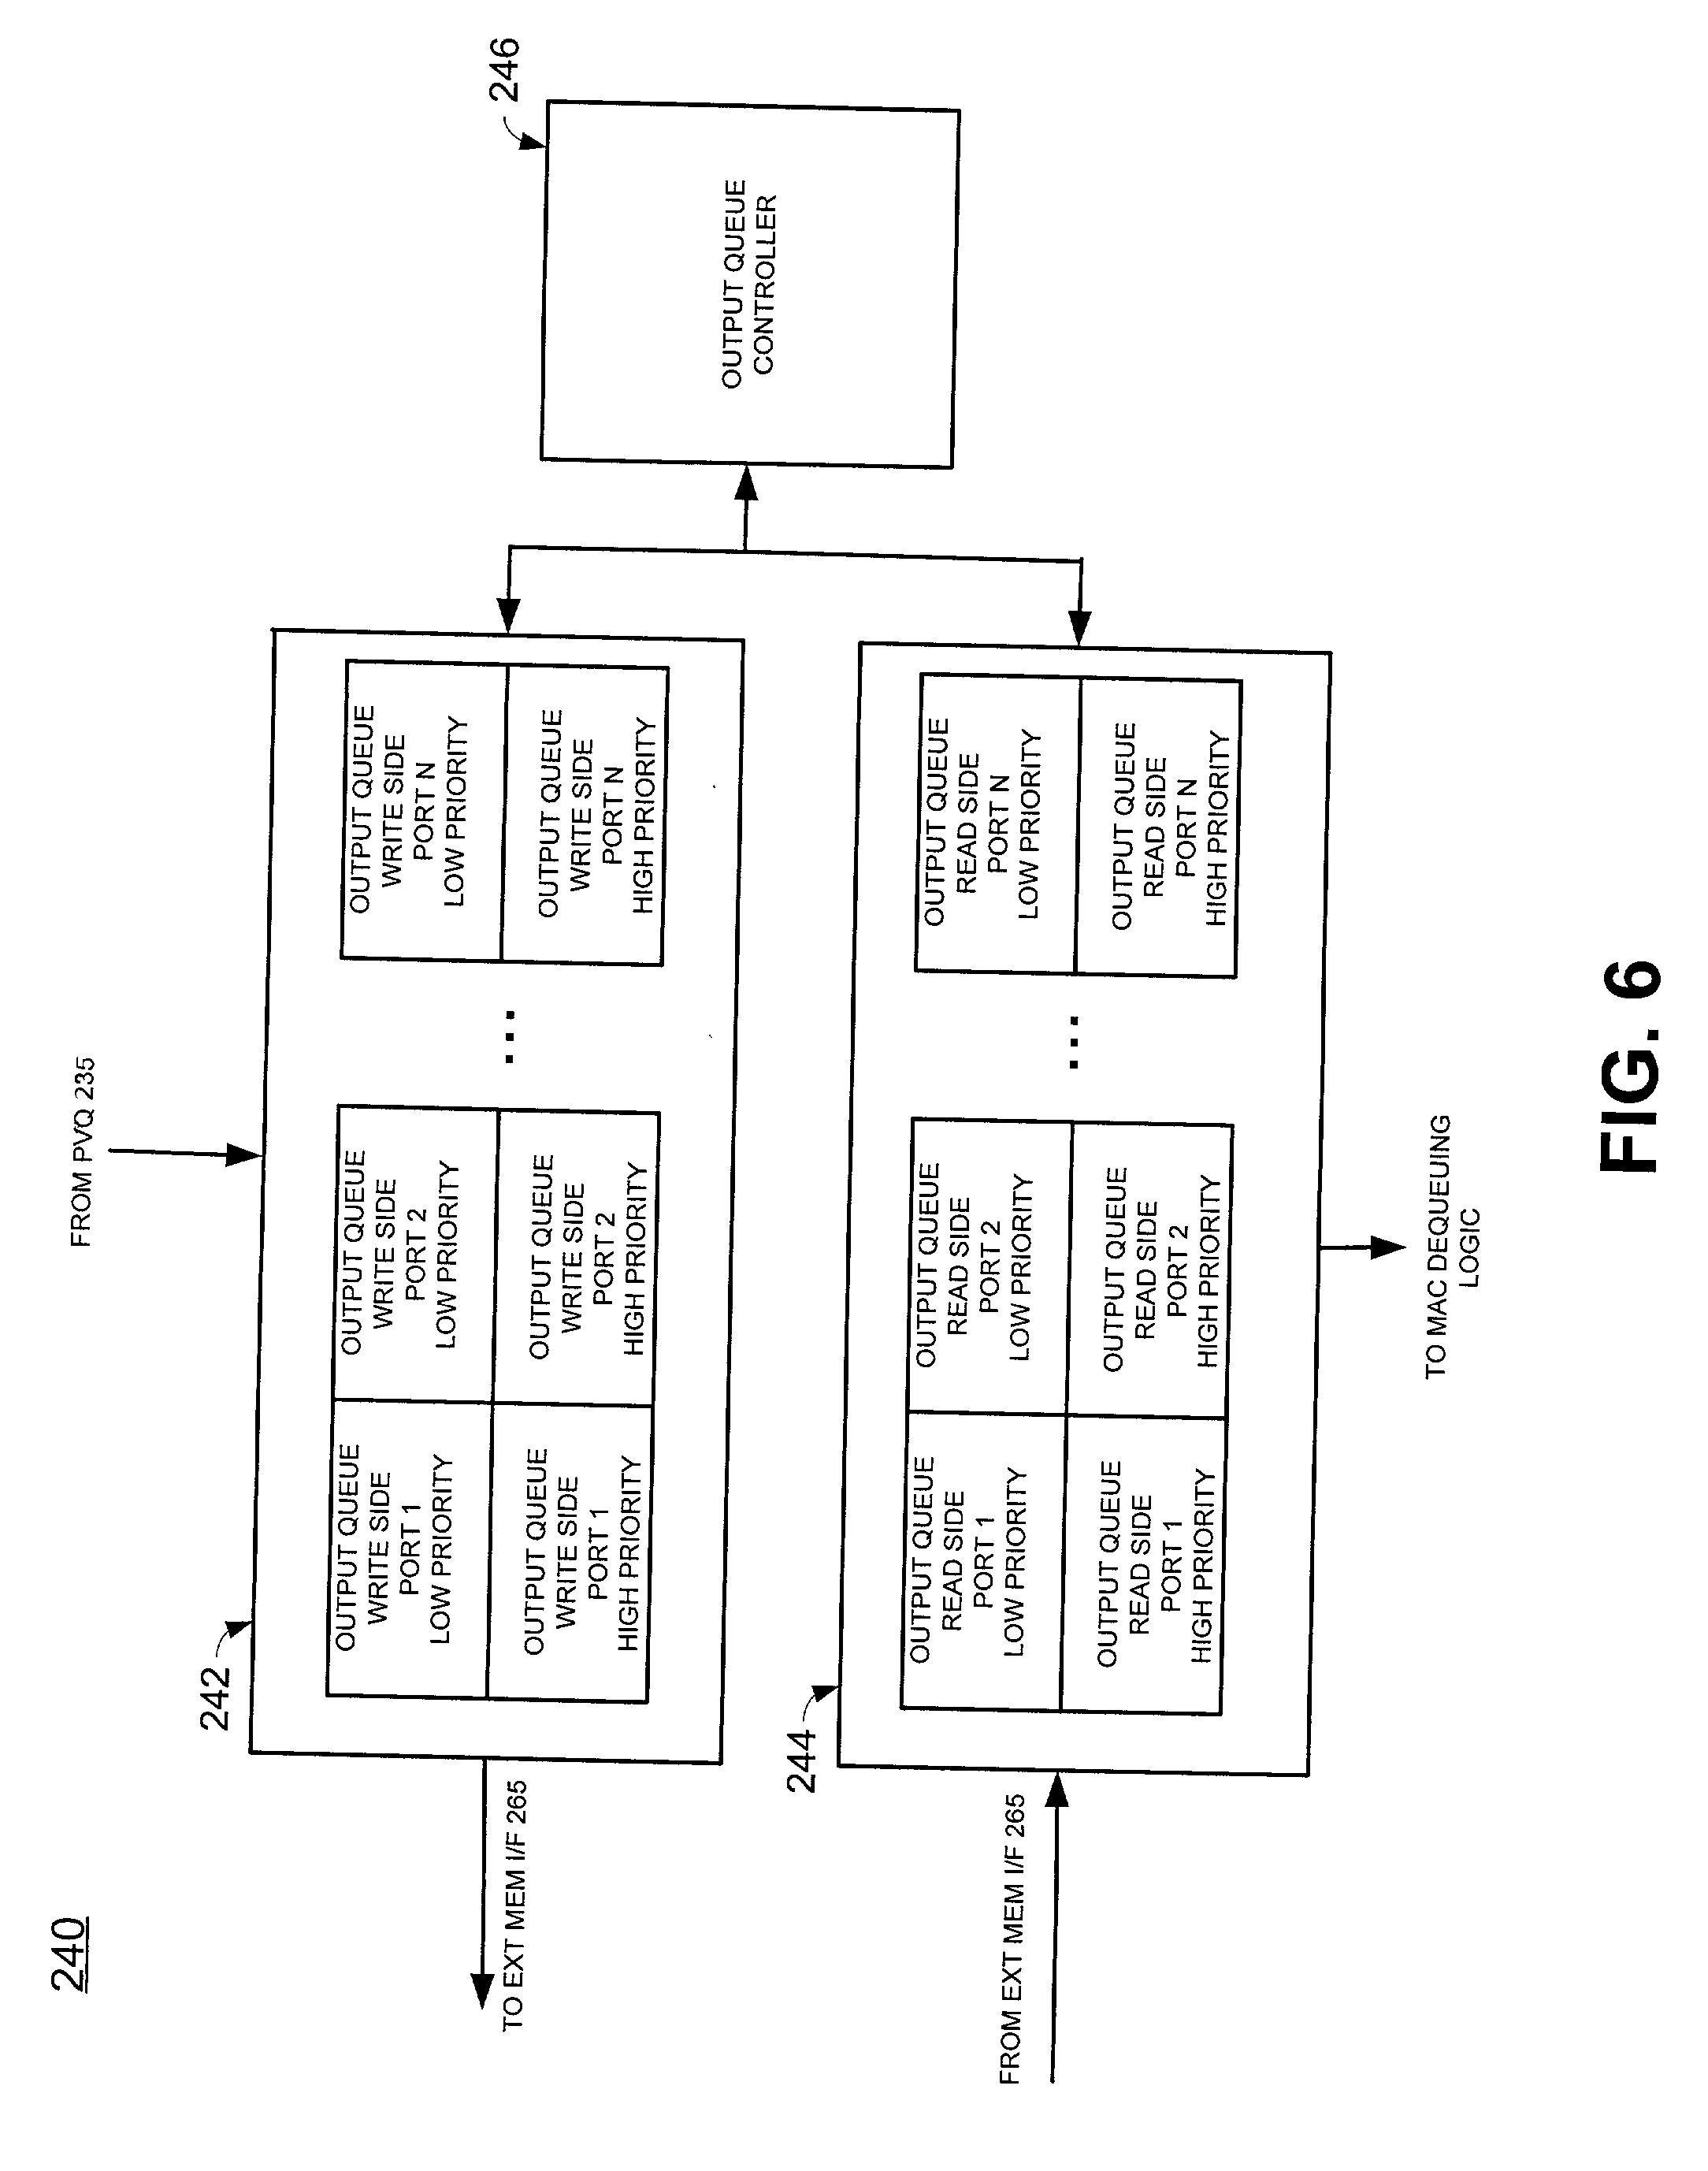 Patent US 20020087723A1